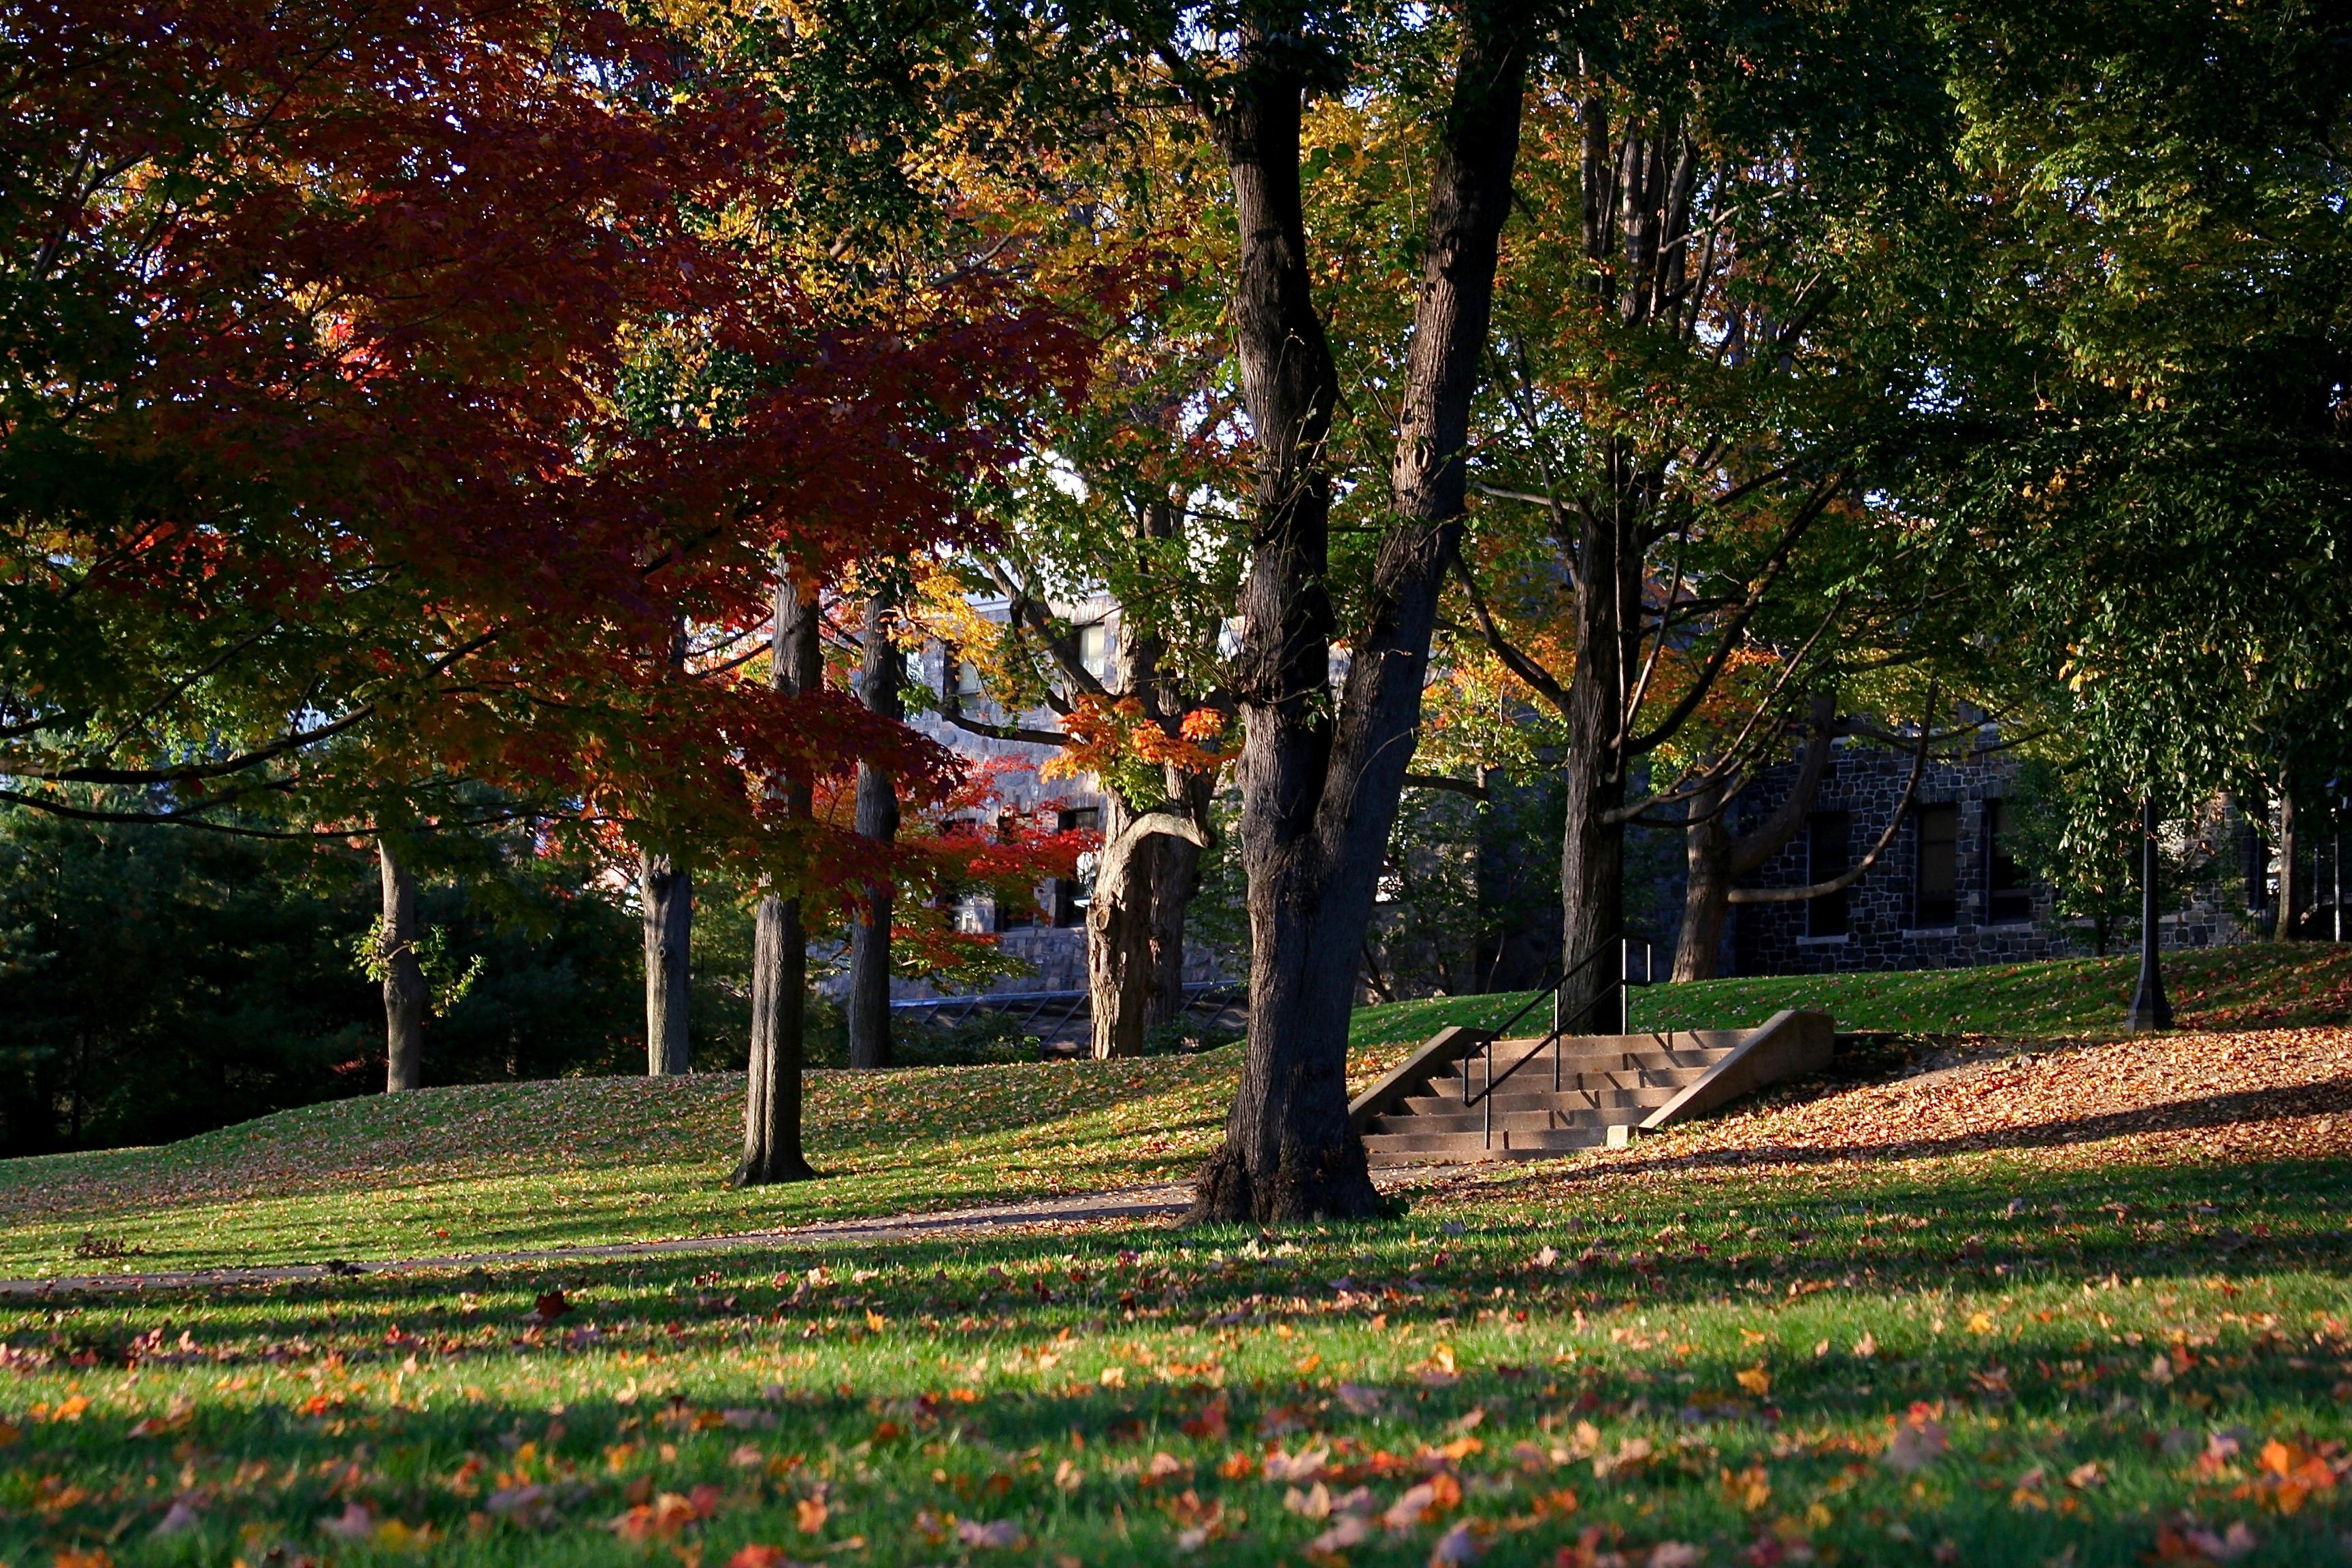 tufts_university_-_garden_presidents_lawn_